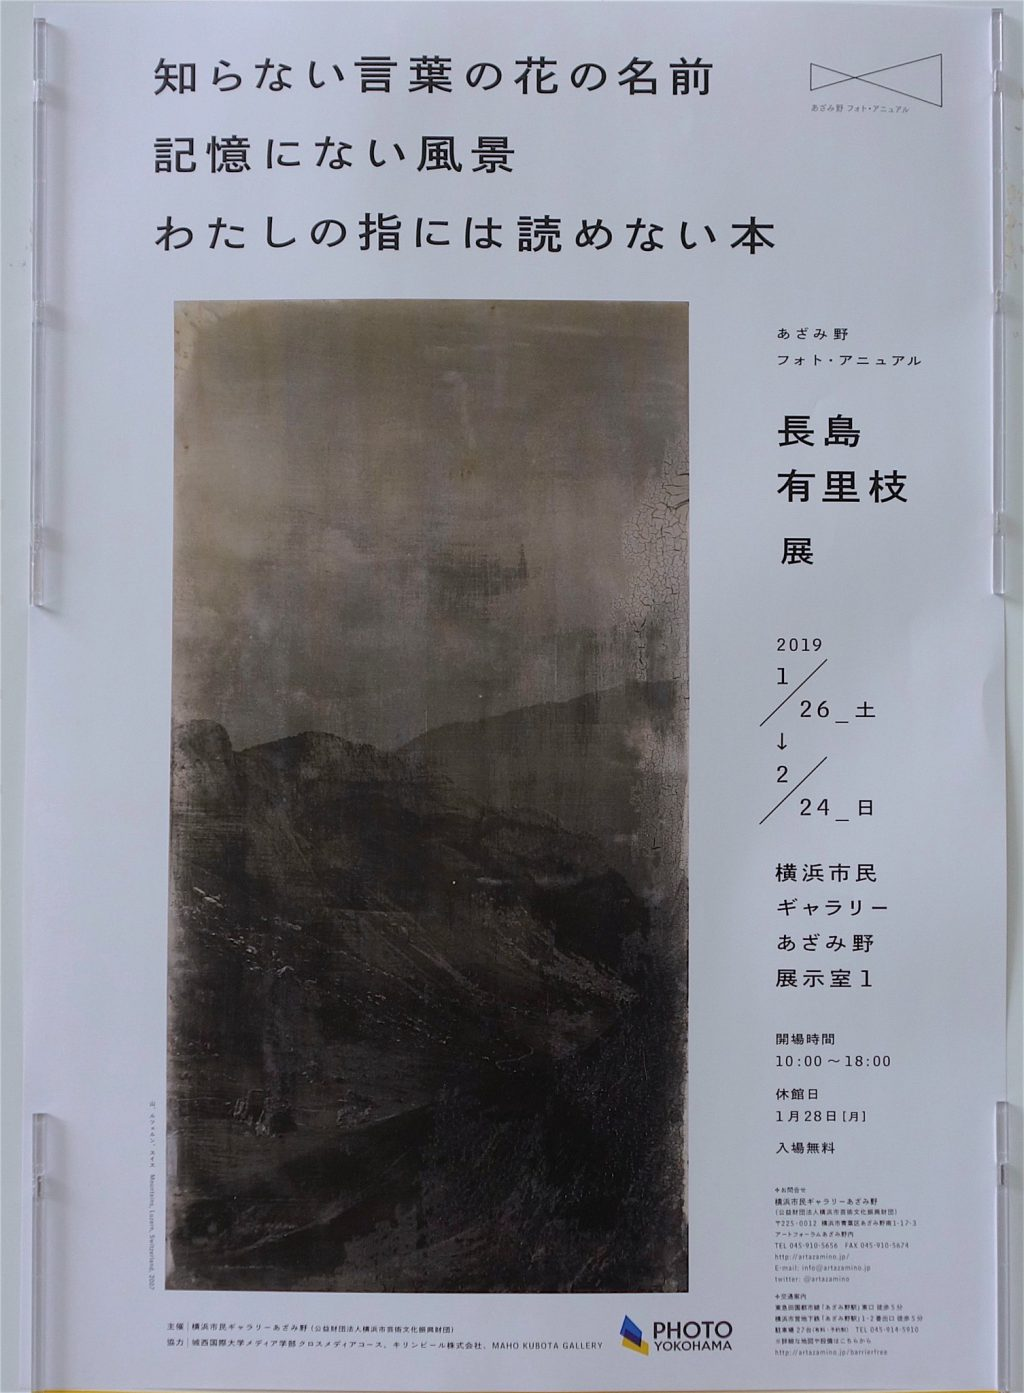 NAGASHIMA Yurie